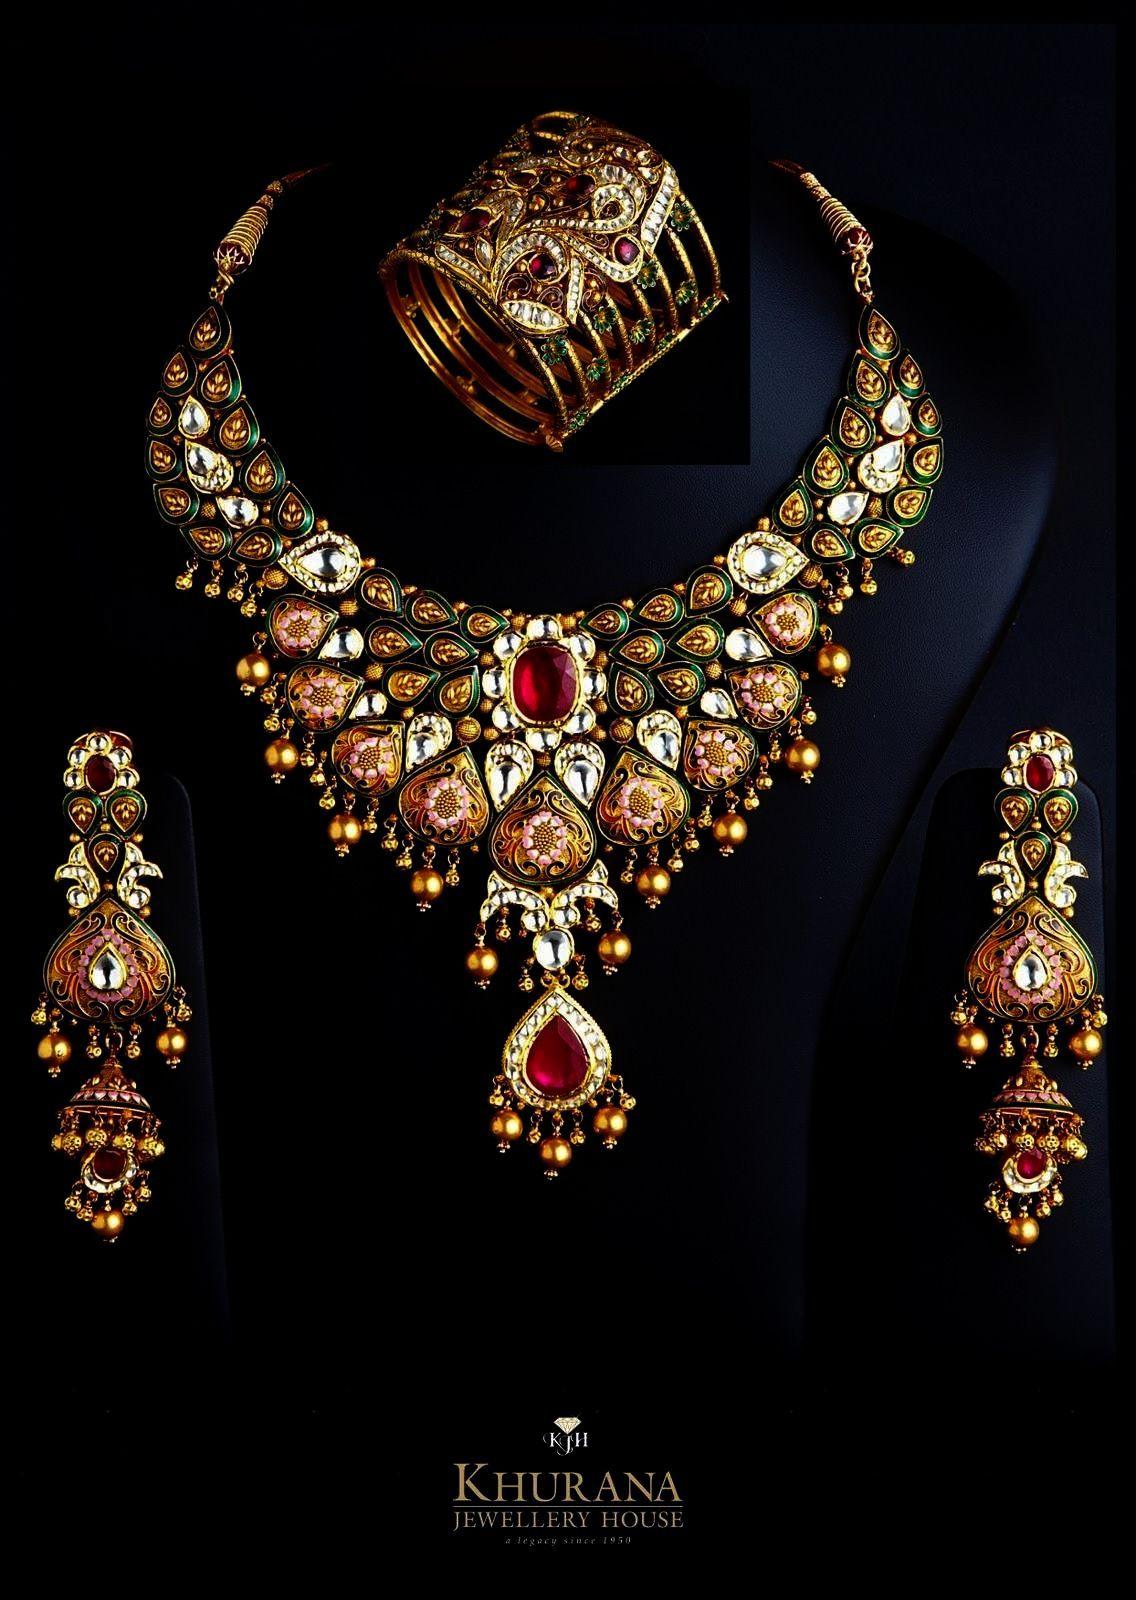 Body piercing near me  Remarkable ue Diamond Jewelry Shops Near Me facebook  Diamond